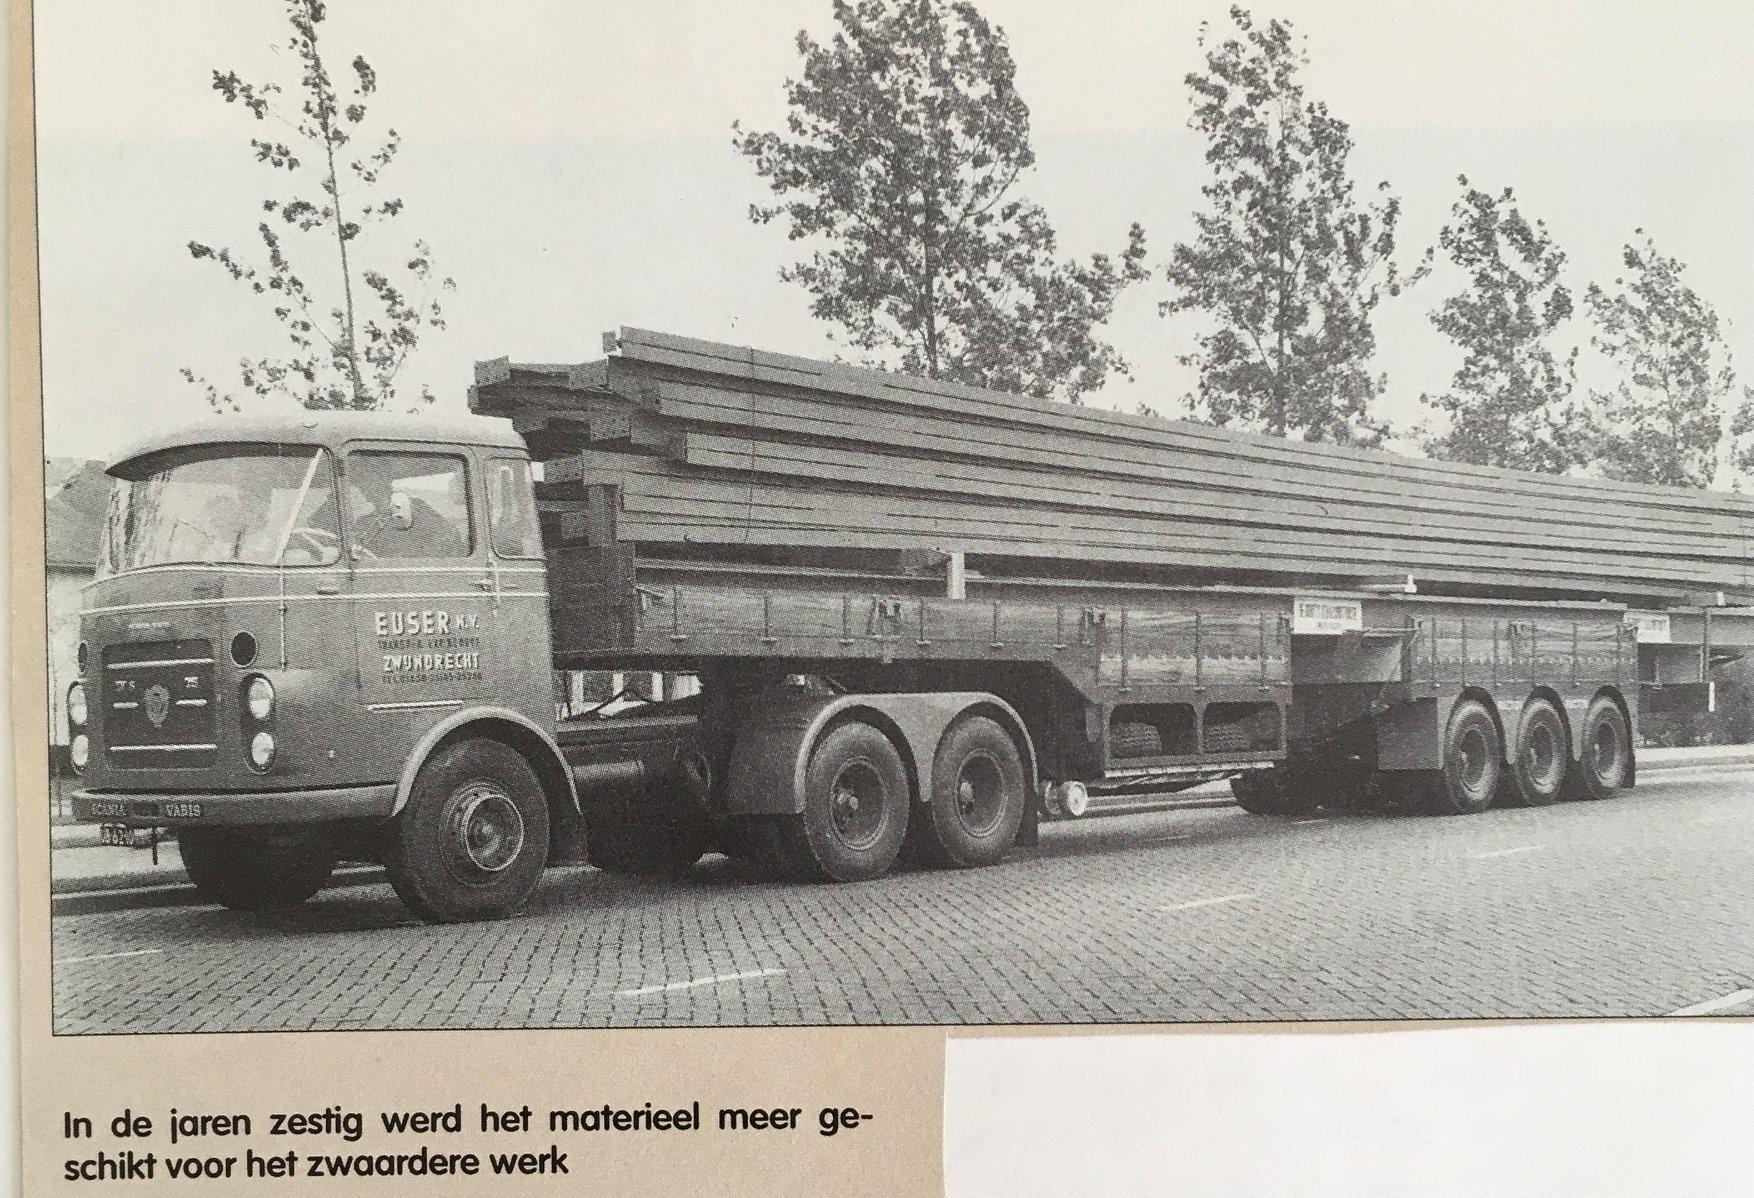 Scania-Vabis--Rudi-Zemann-archief